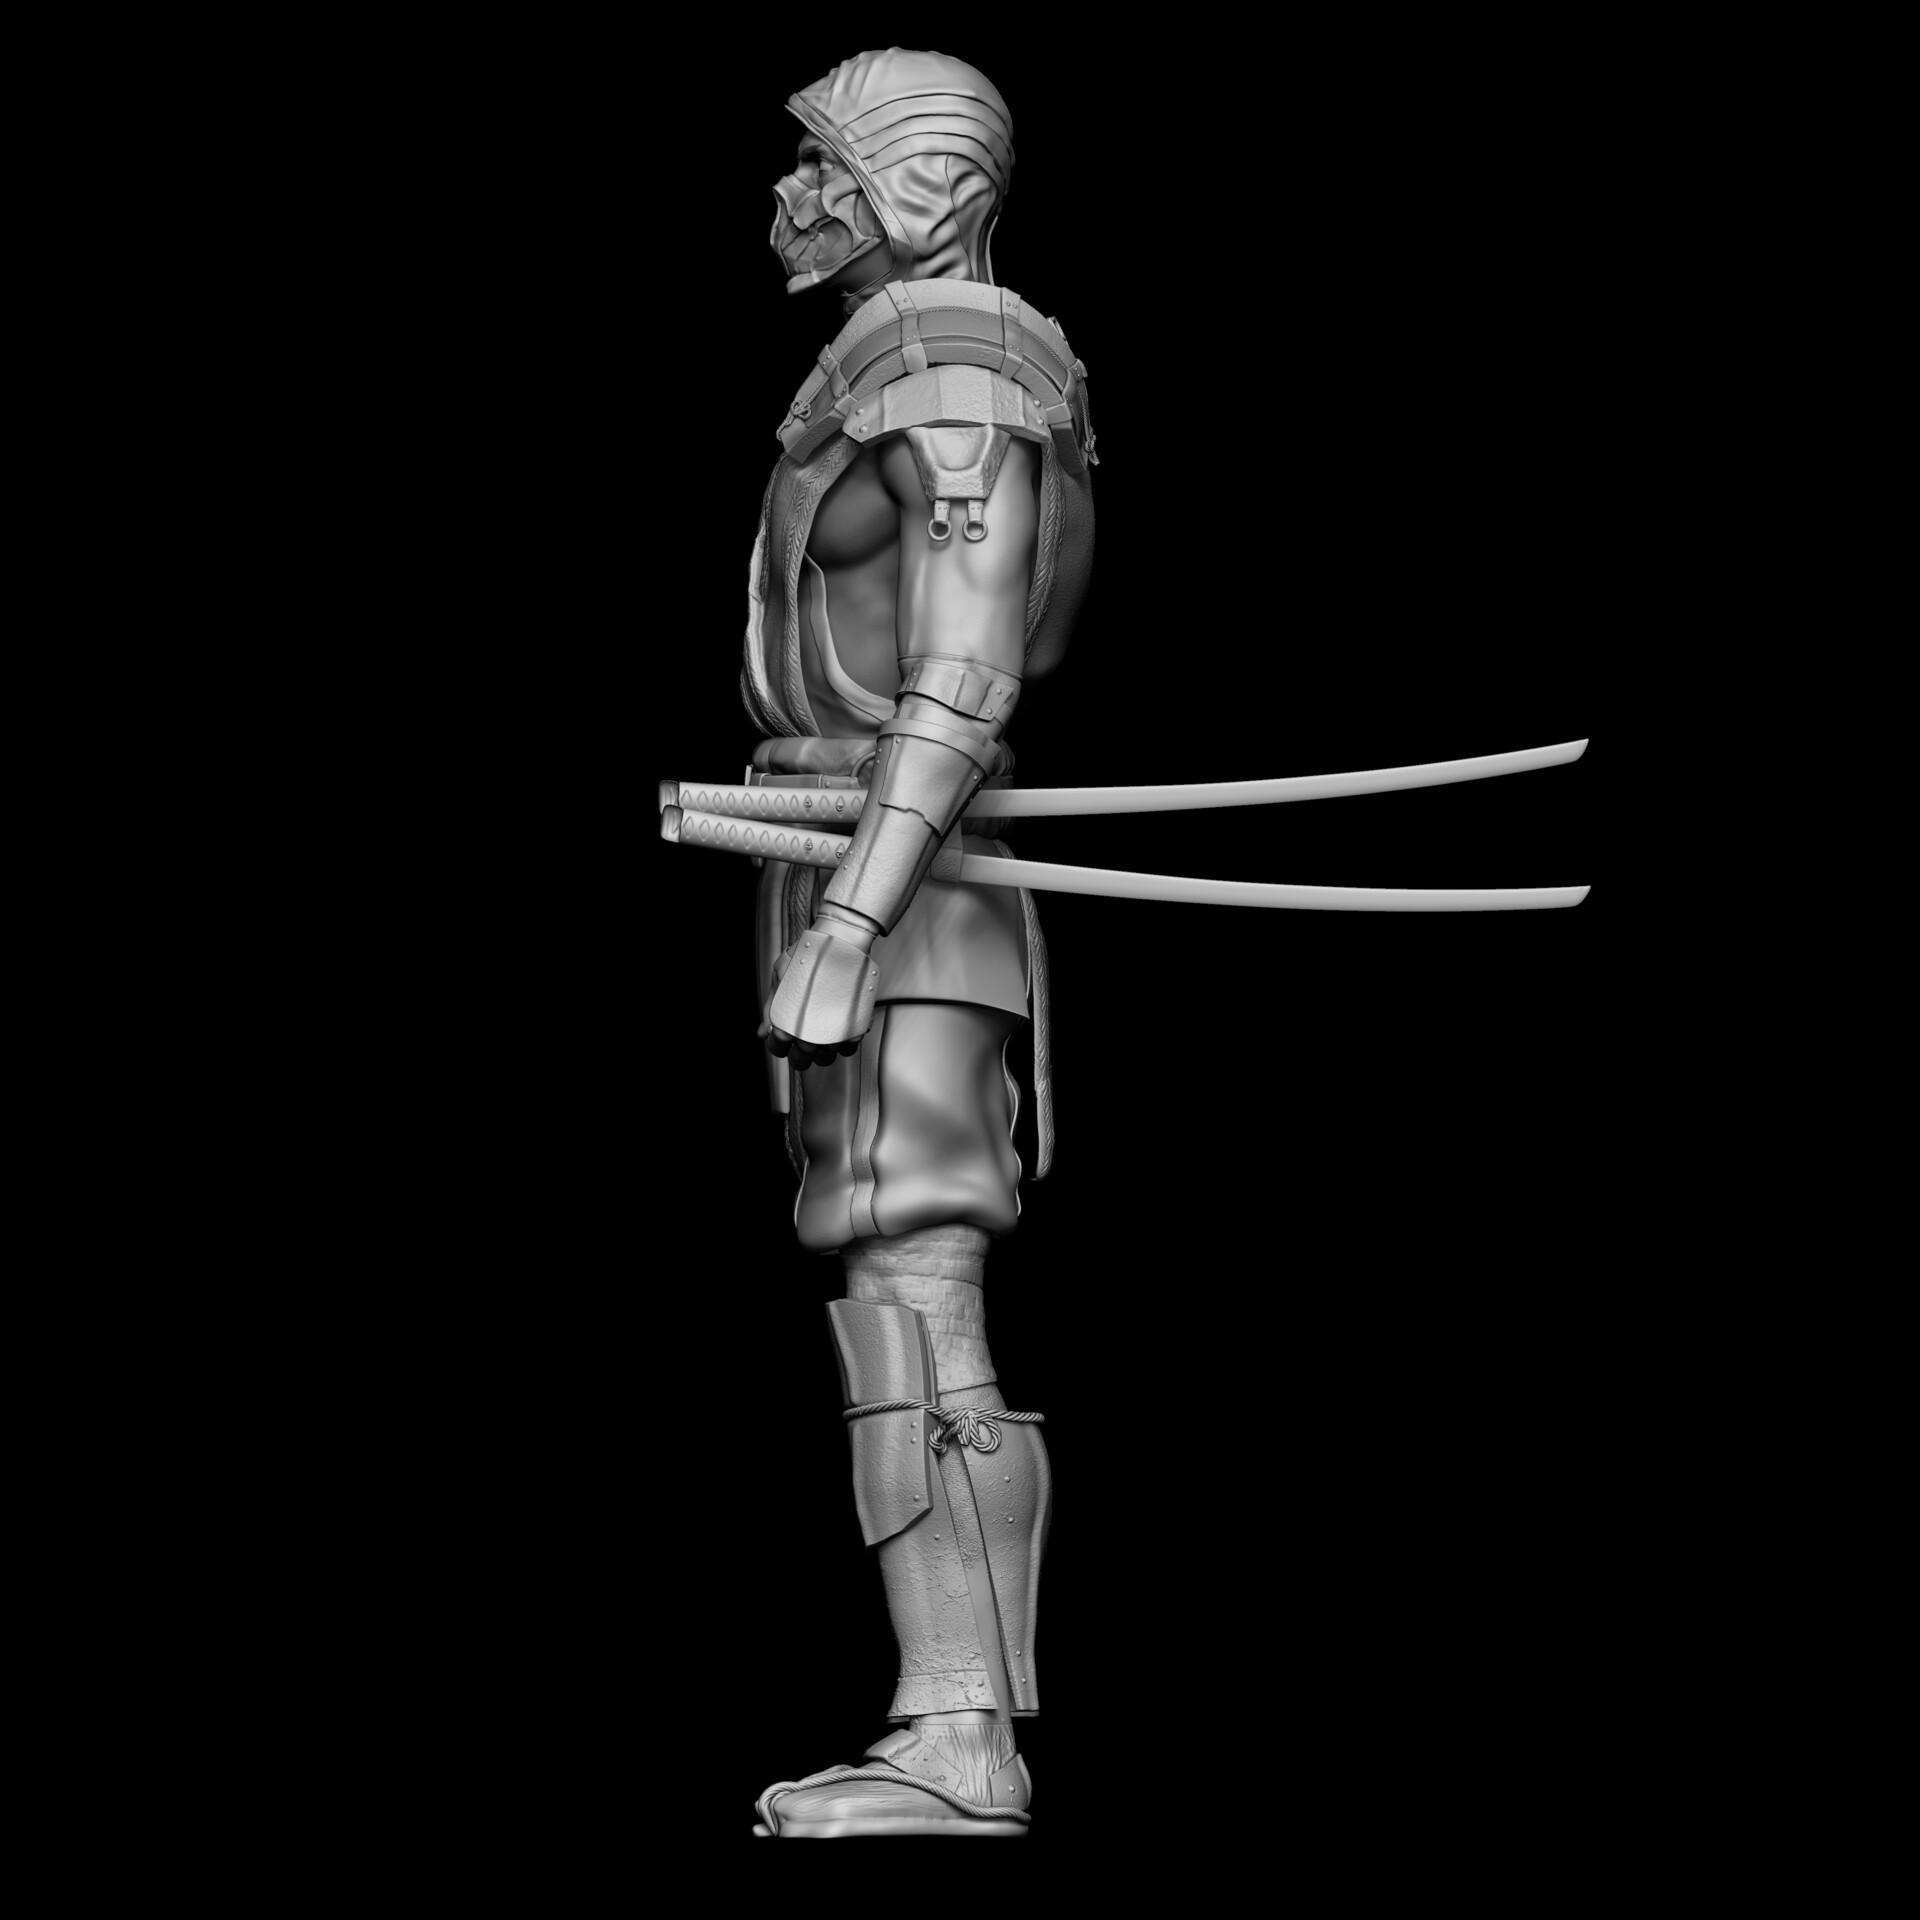 Artstation Scorpion Mortal Kombat Mk 11 Andrew Smuklauski